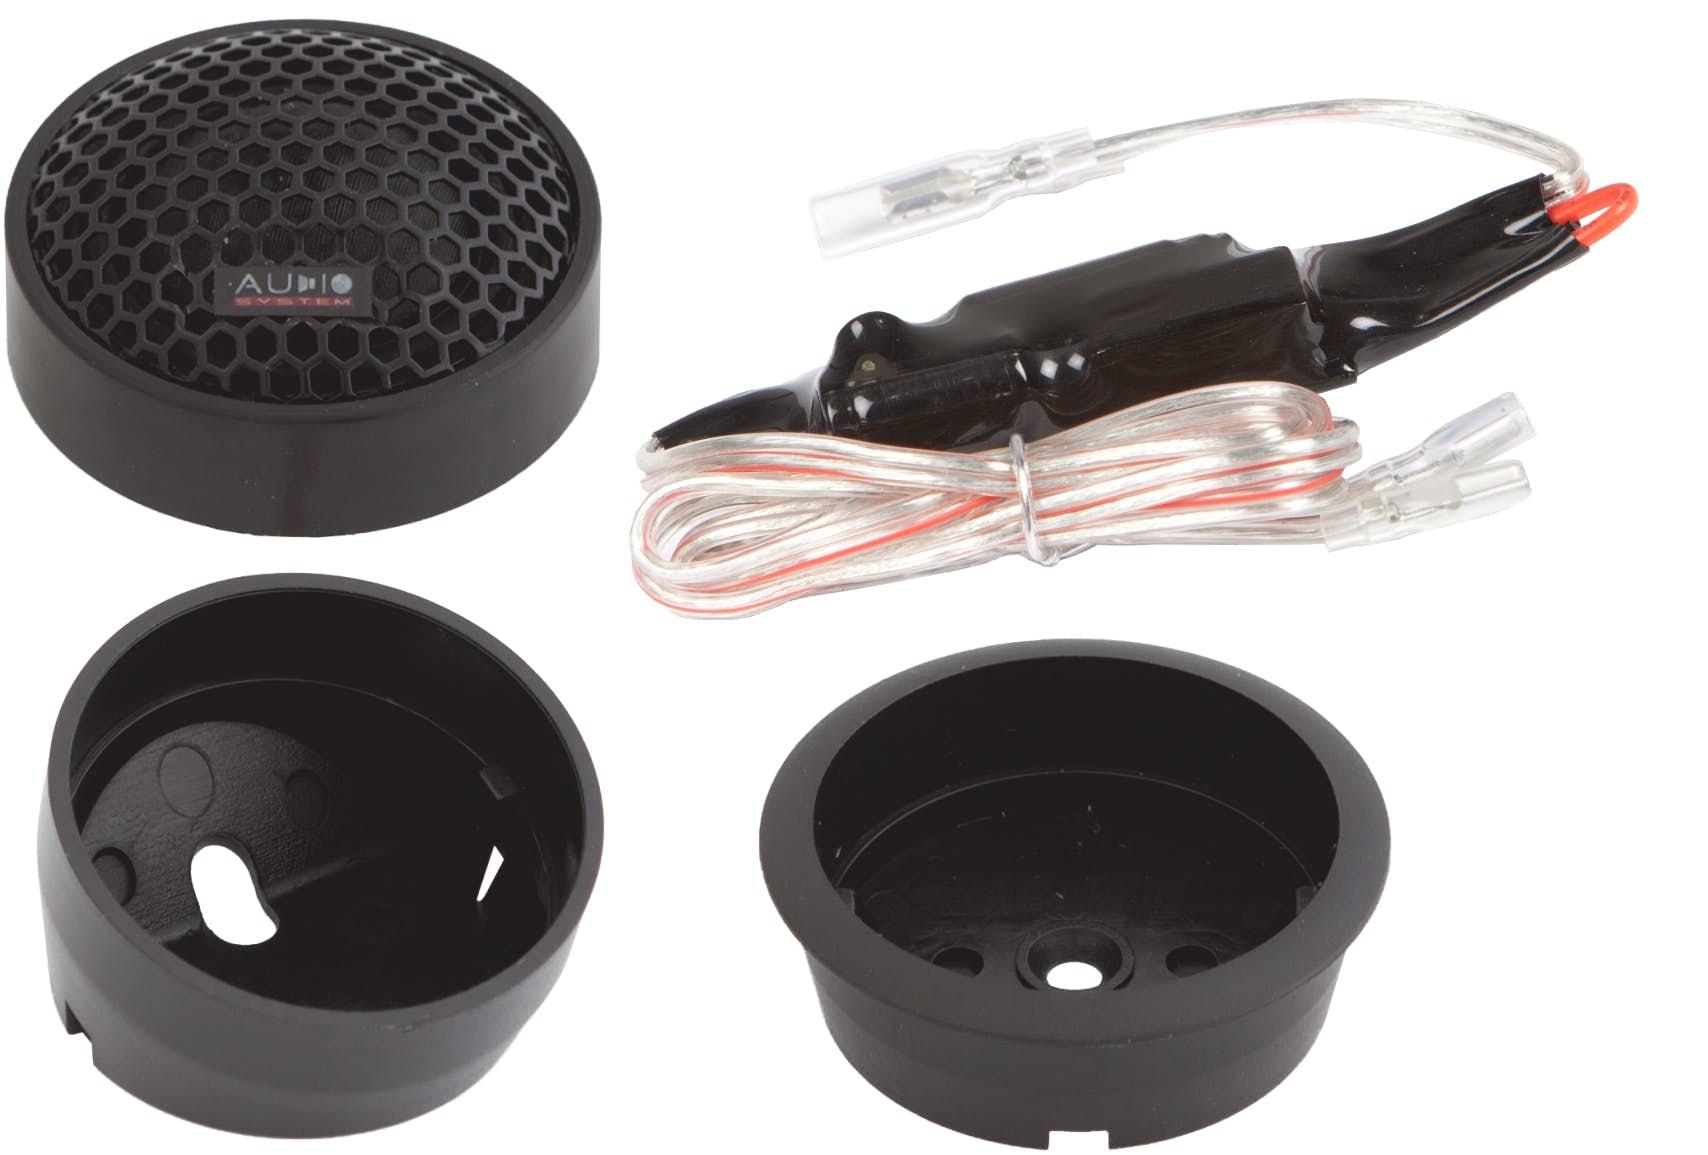 Visokotonci Audio System HS 24 W EVO - Akcija